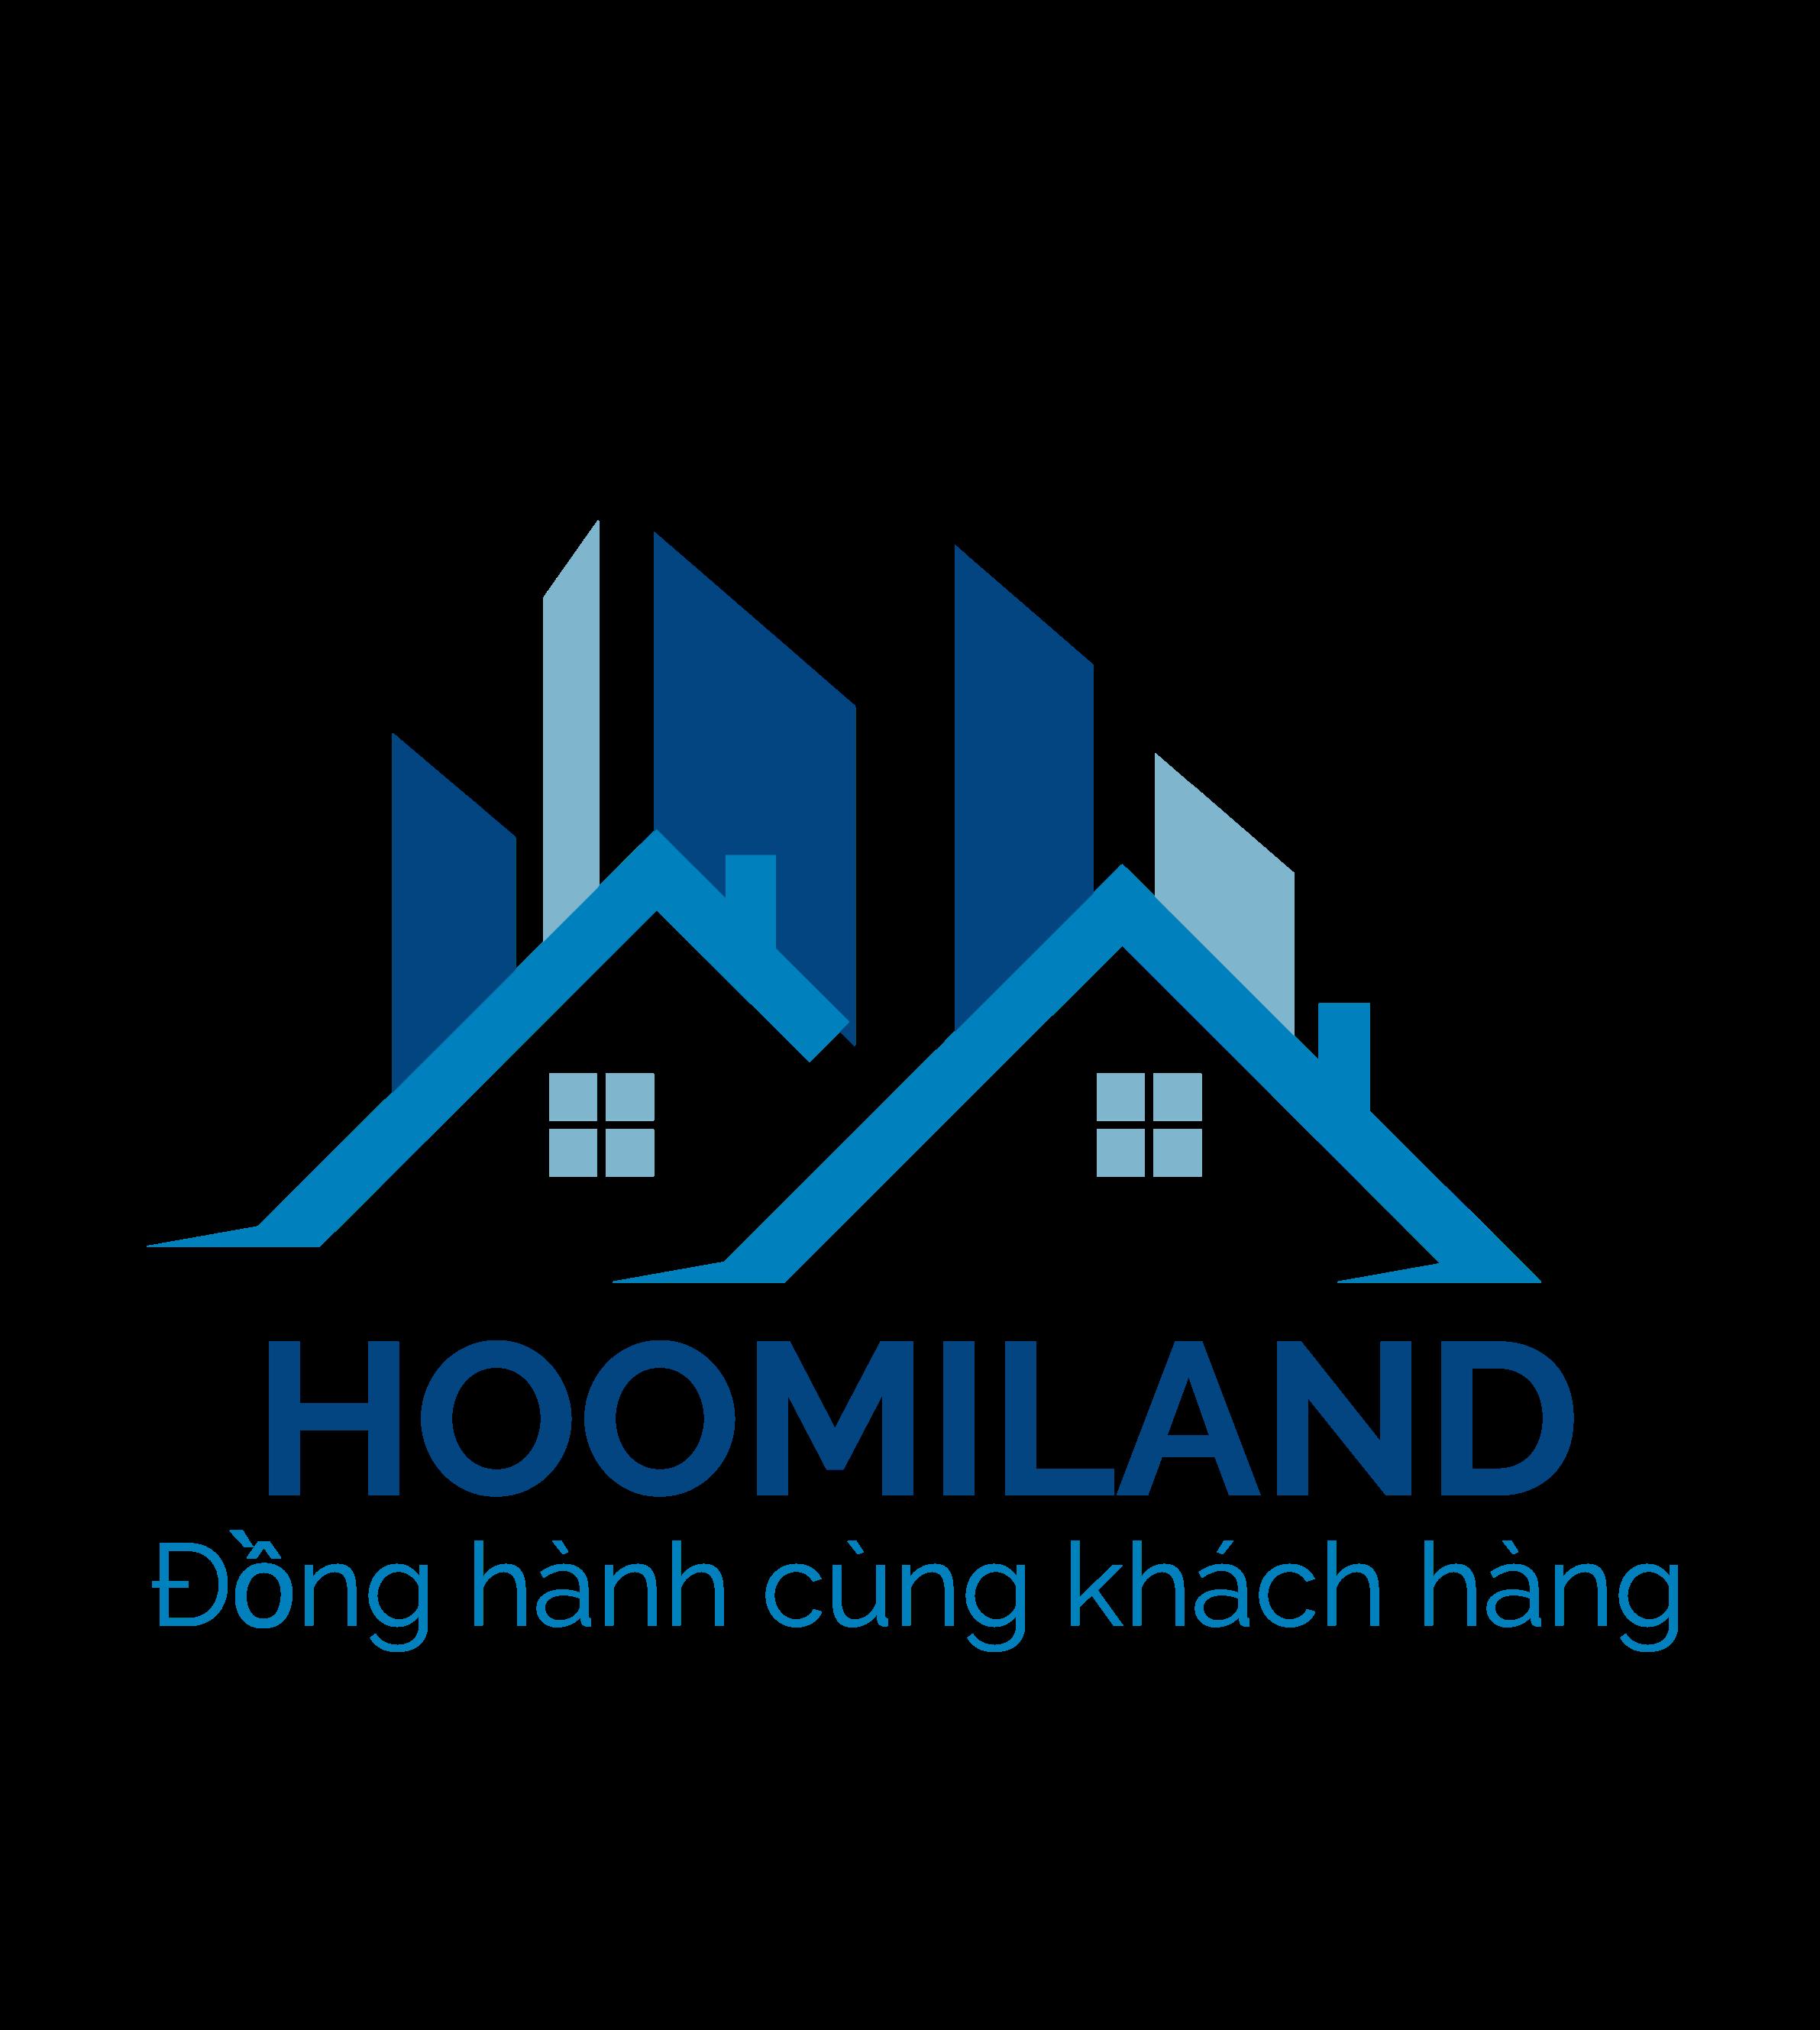 Hoomi Land